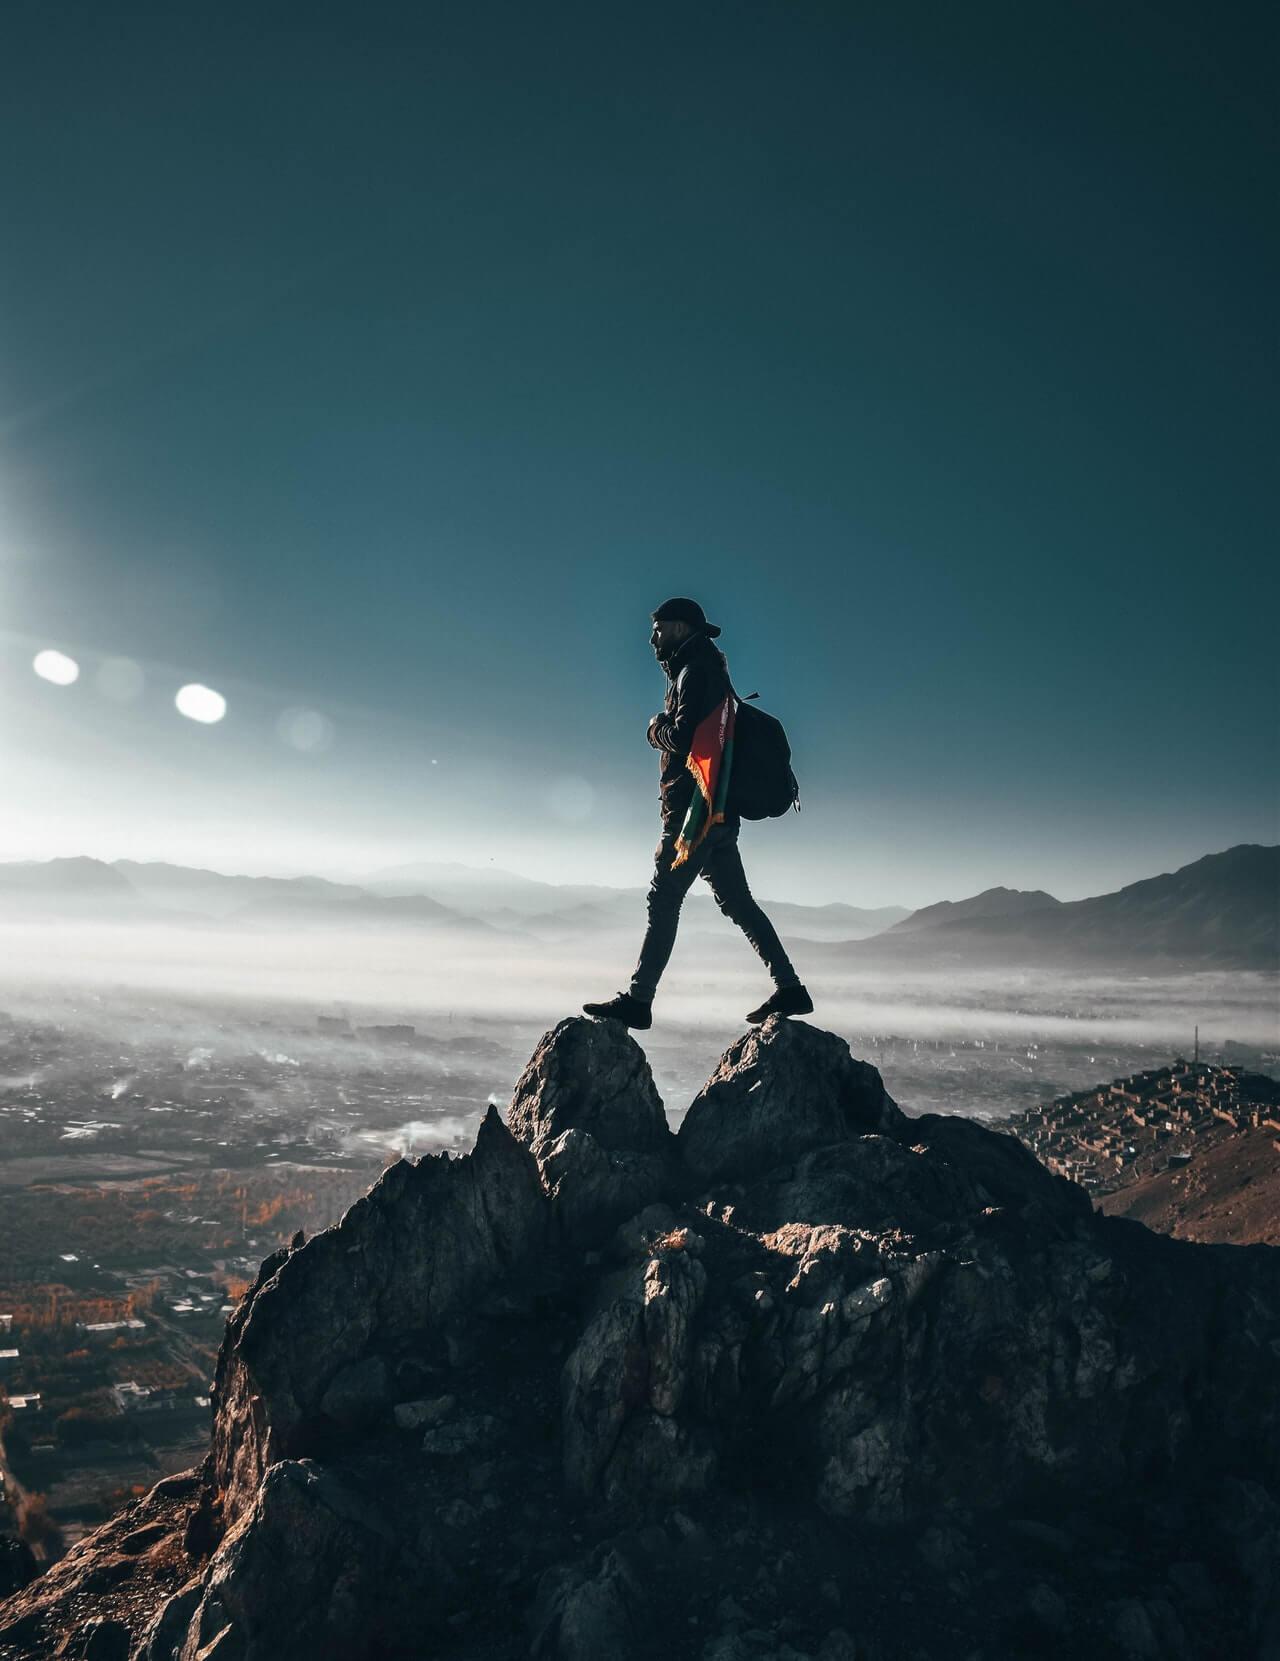 Pendaki Gunung Membunuh Waktu